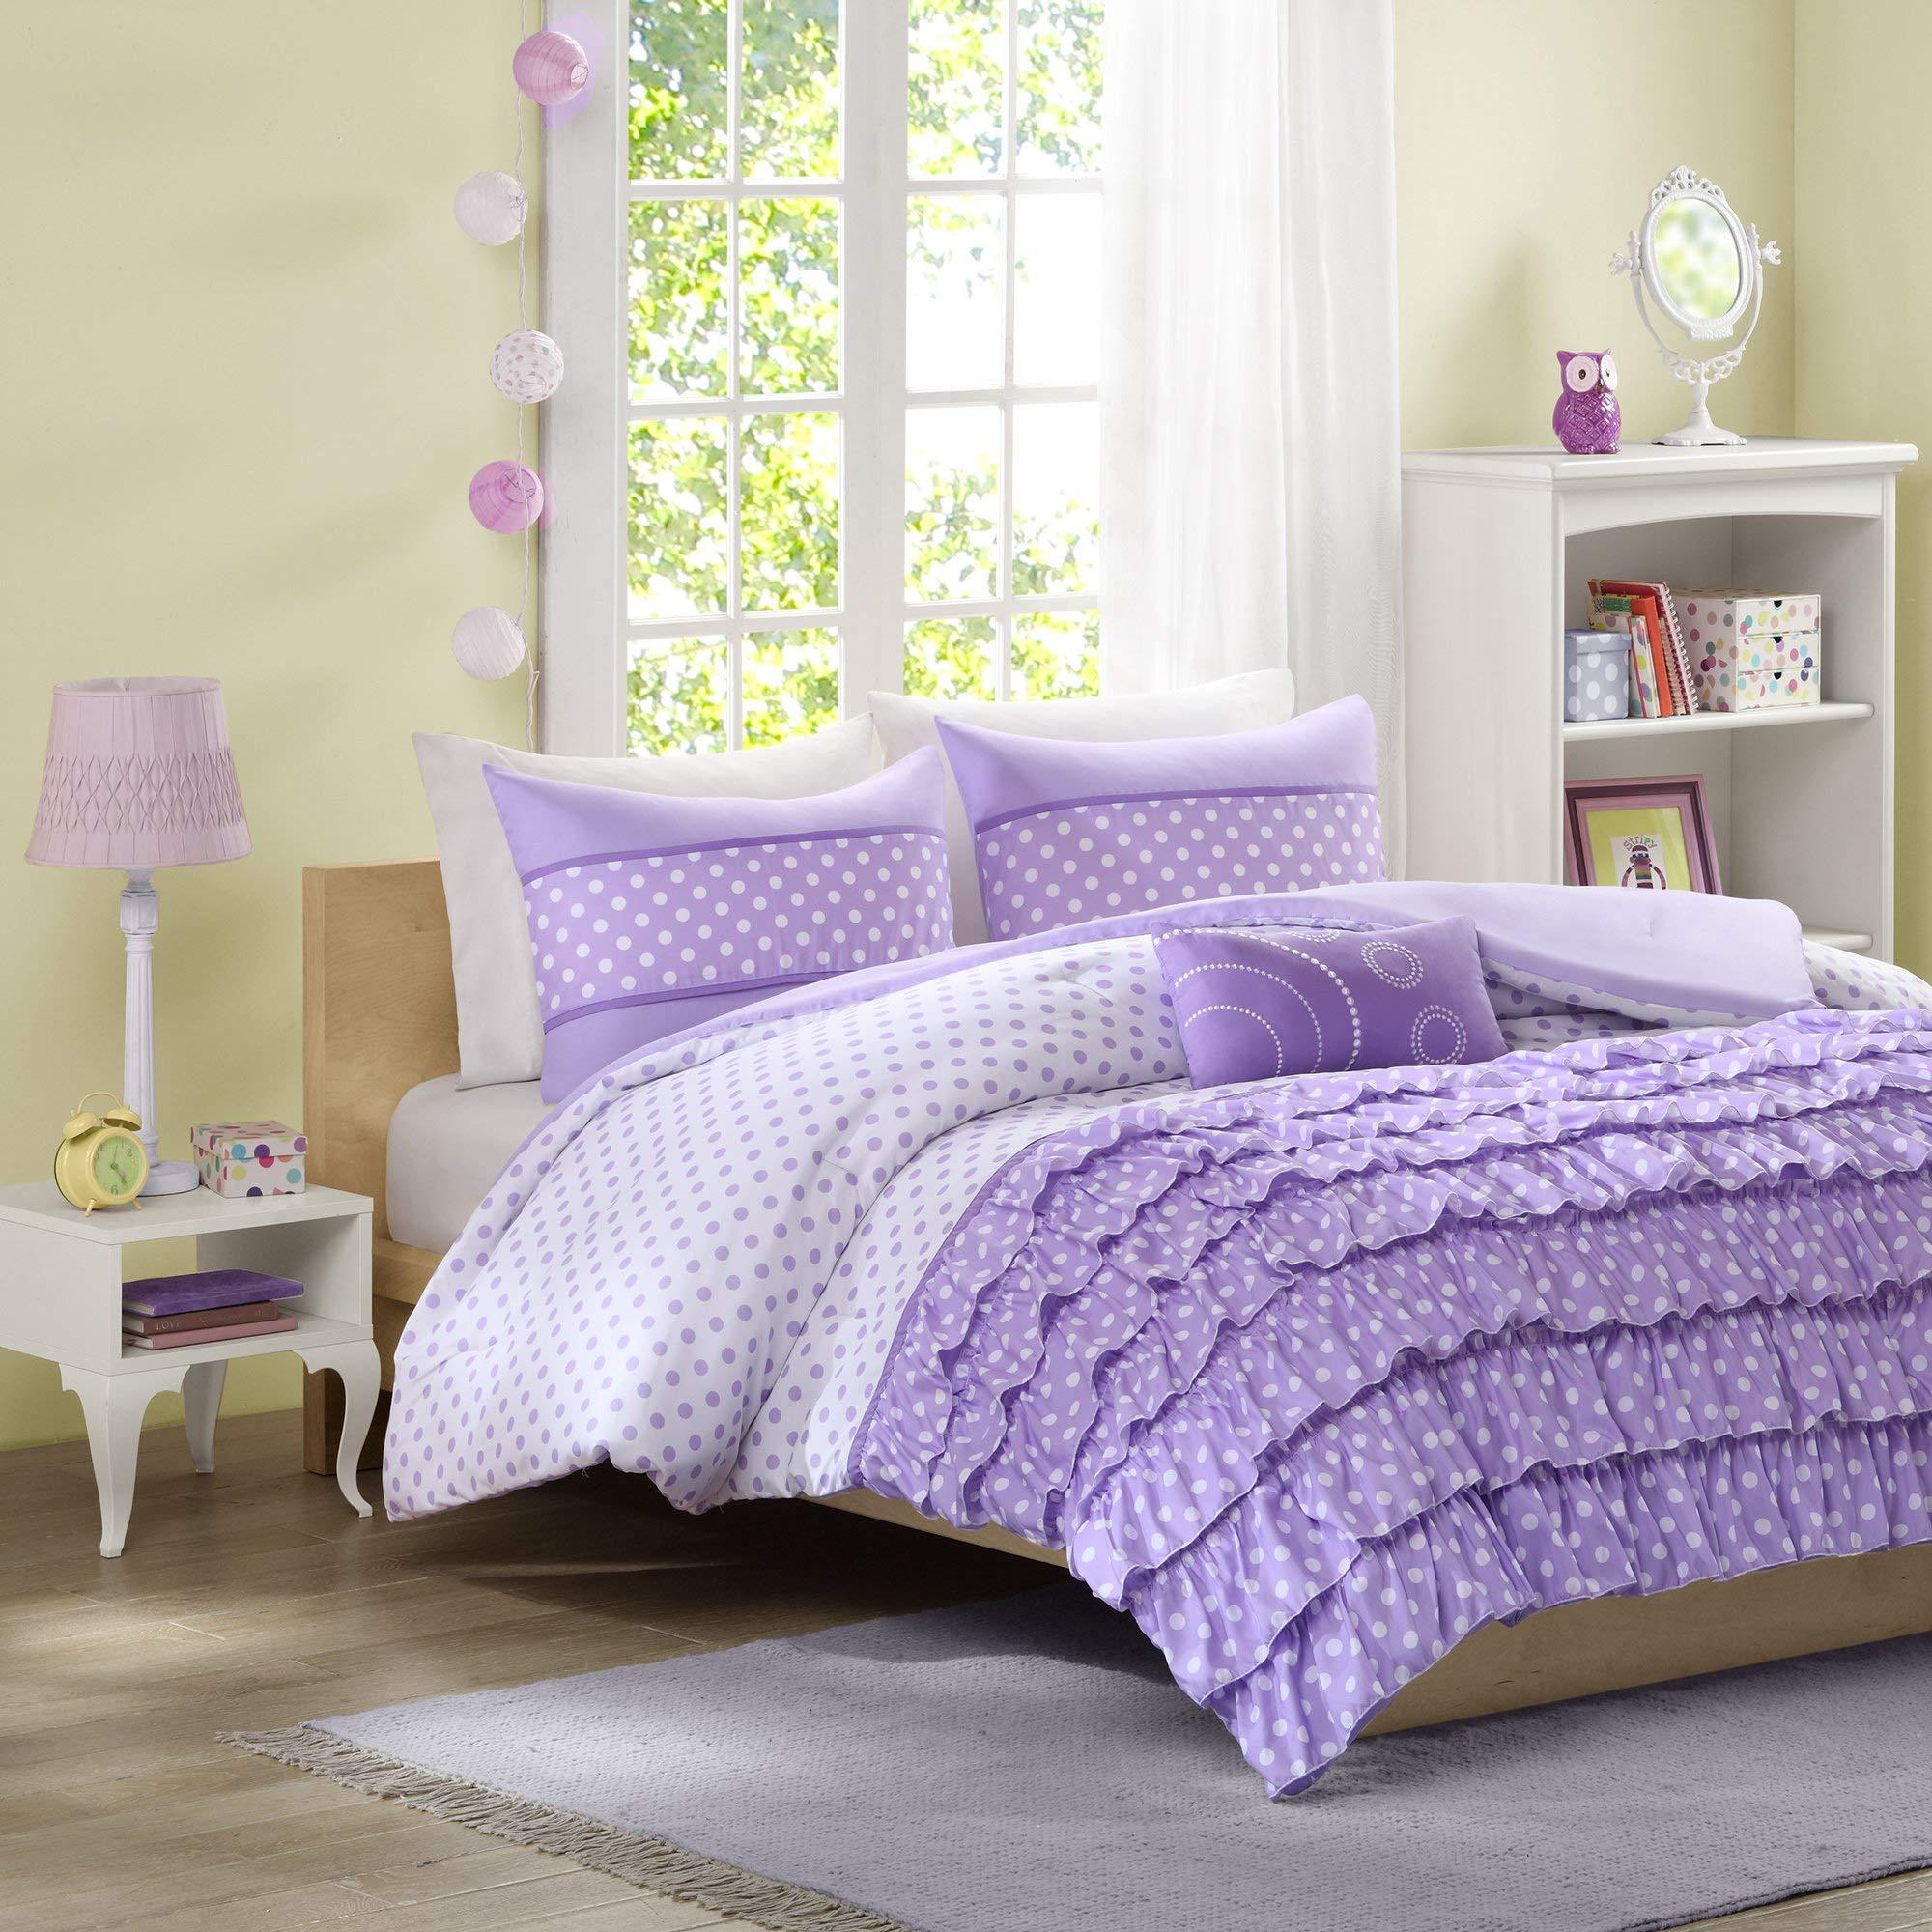 Mi-Zone Morgan Comforter Set Twin/Twin XL Size - Purple, Polka Dot – 3 Piece Bed Sets – Ultra Soft Microfiber Teen Bedding for Girls Bedroom